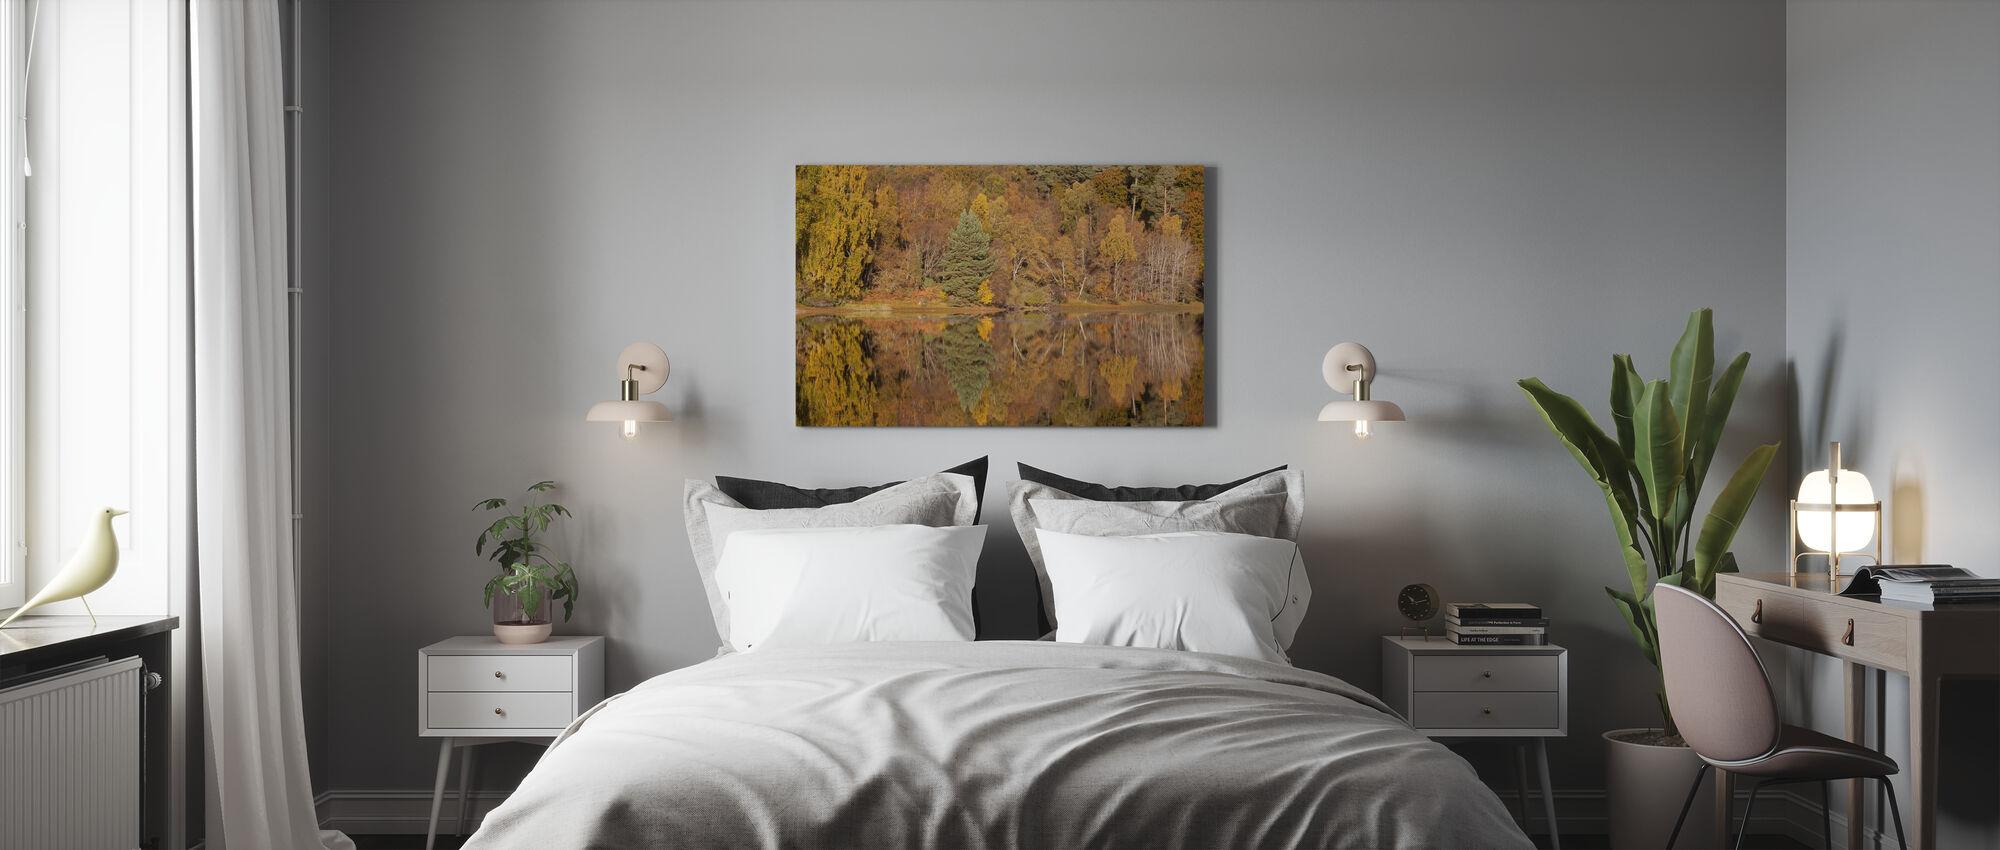 Trees Reflecting in Loch Vaa, Highlands, Scotland, UK - Canvas print - Bedroom